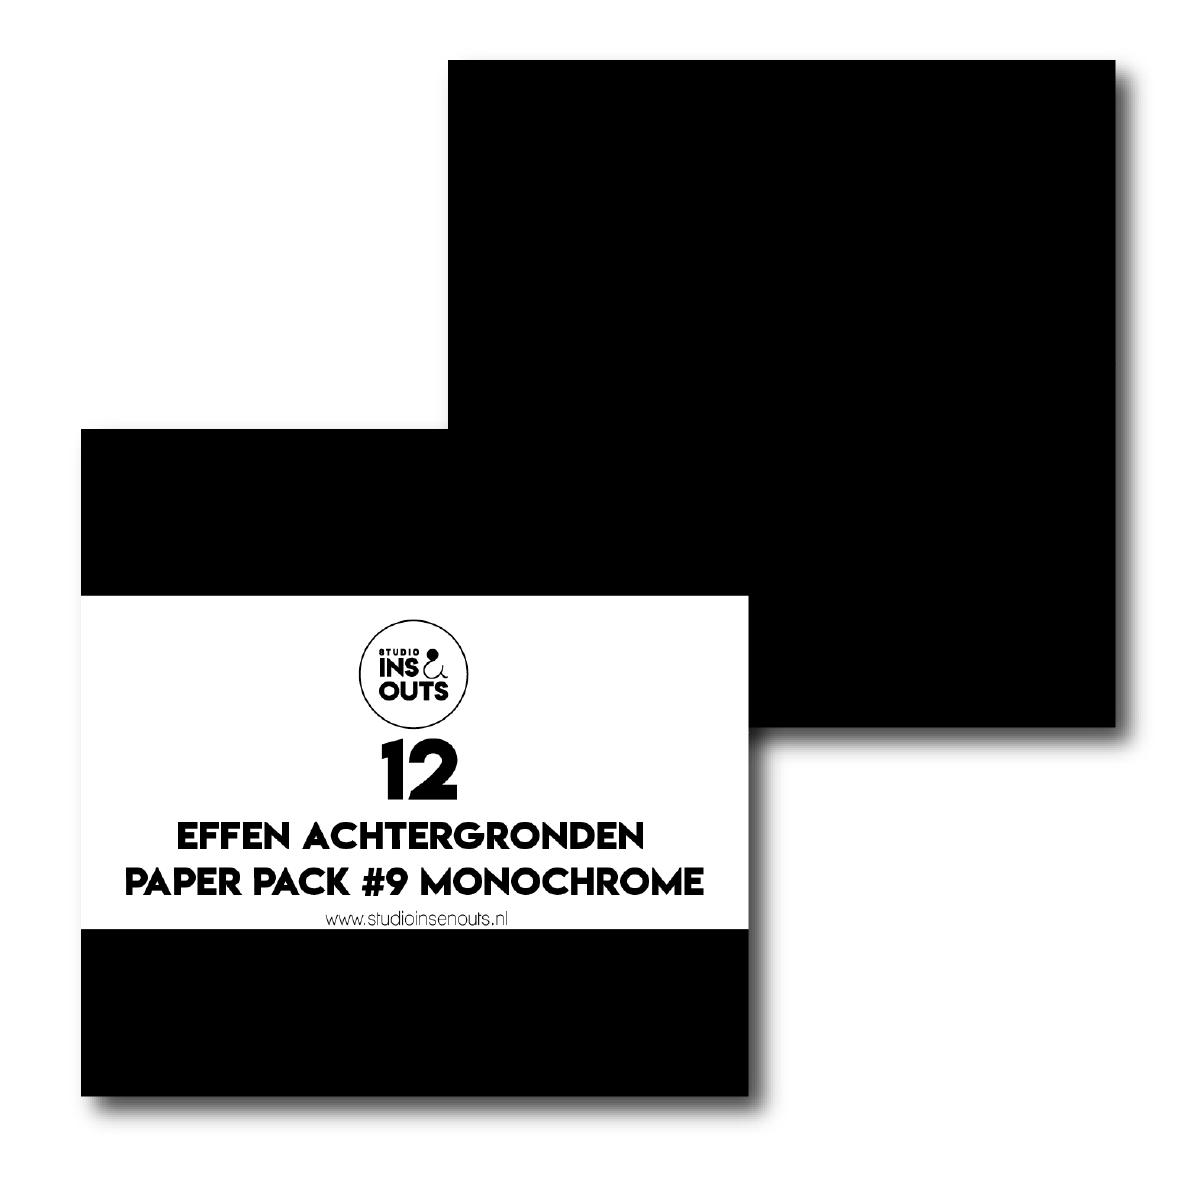 Paper Pack #9 - monochrome effen